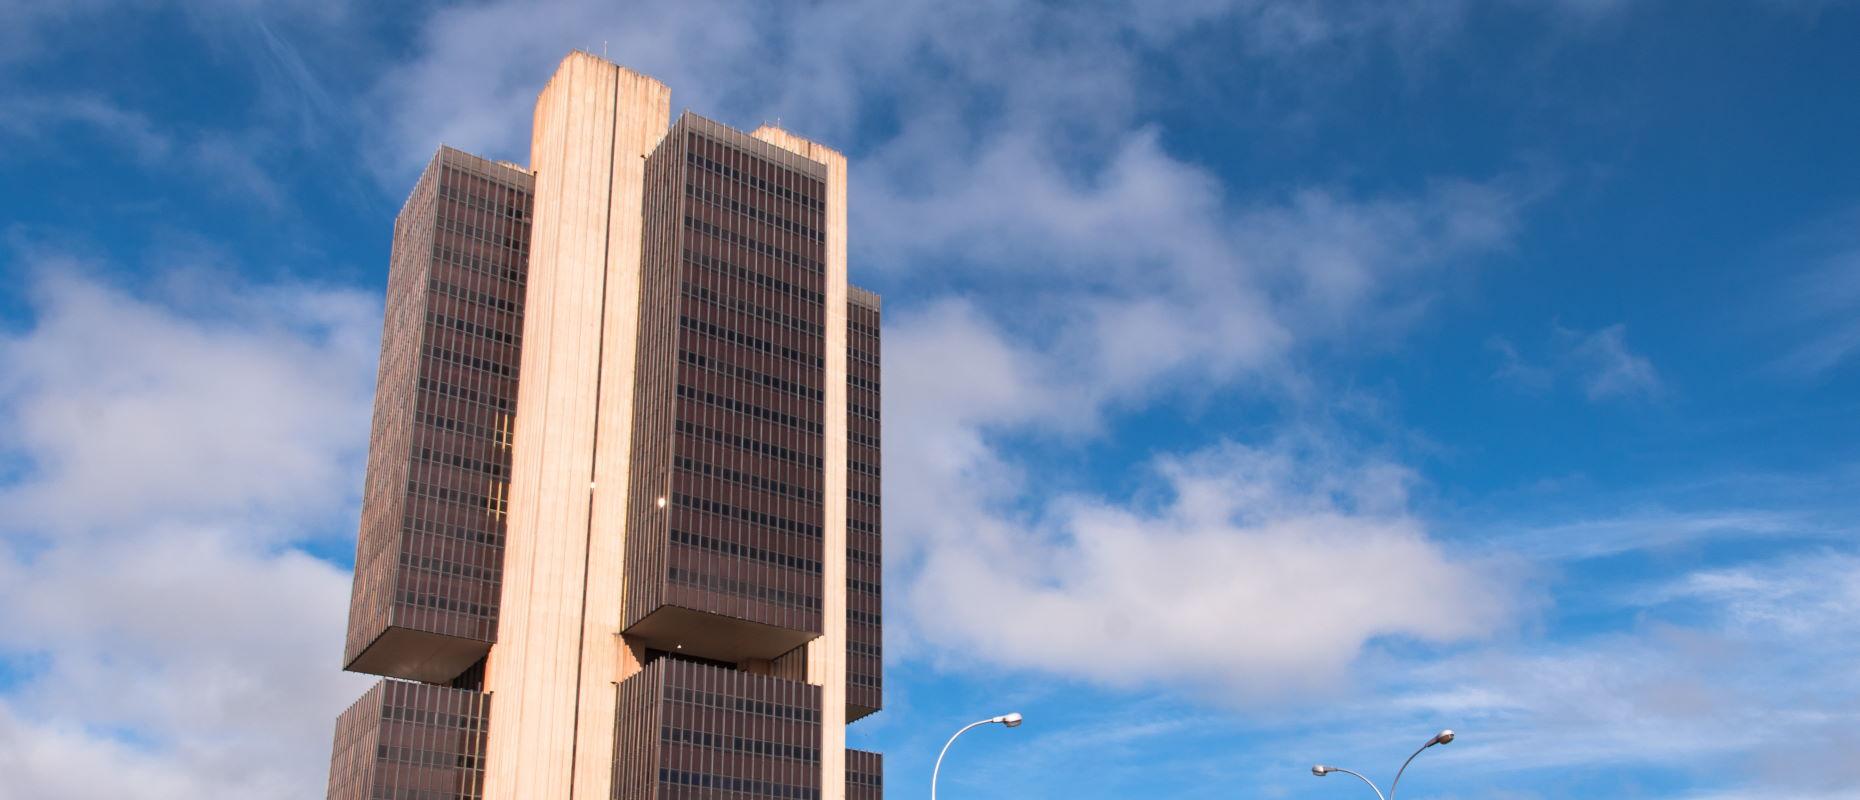 Bacen regulamenta o Open Banking no Brasil